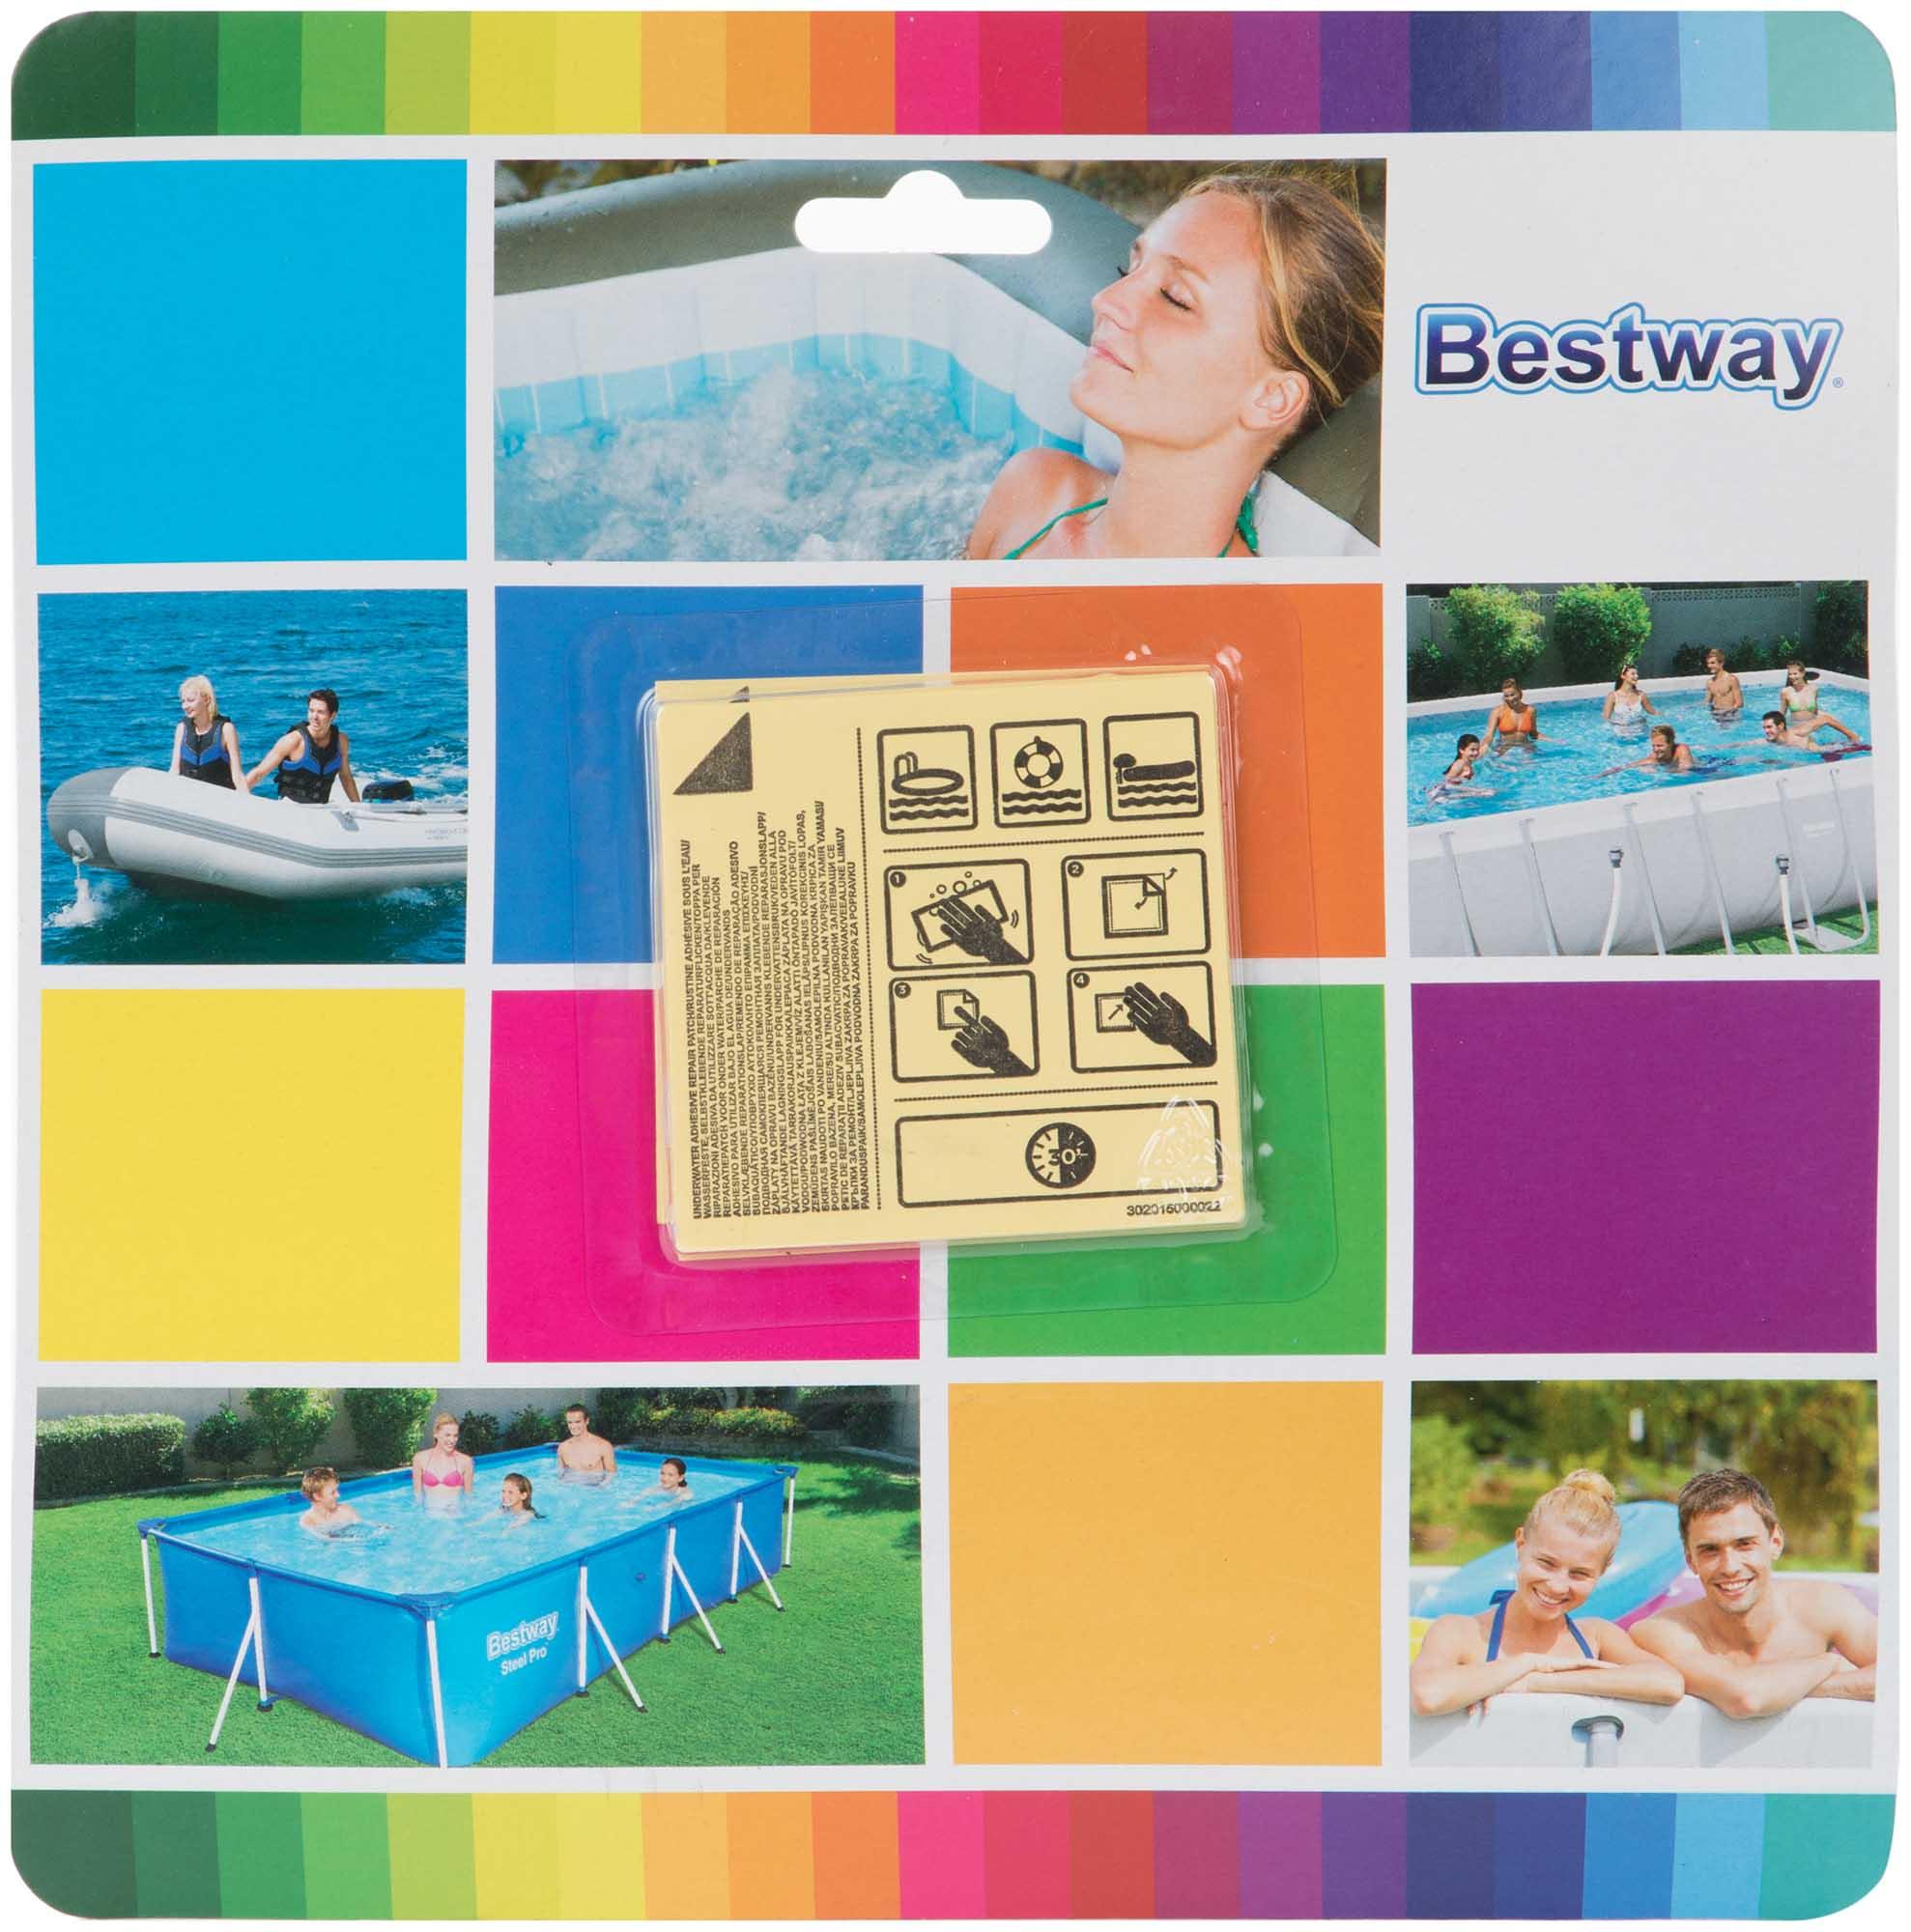 Bestway Ремонтный комплект Bestway